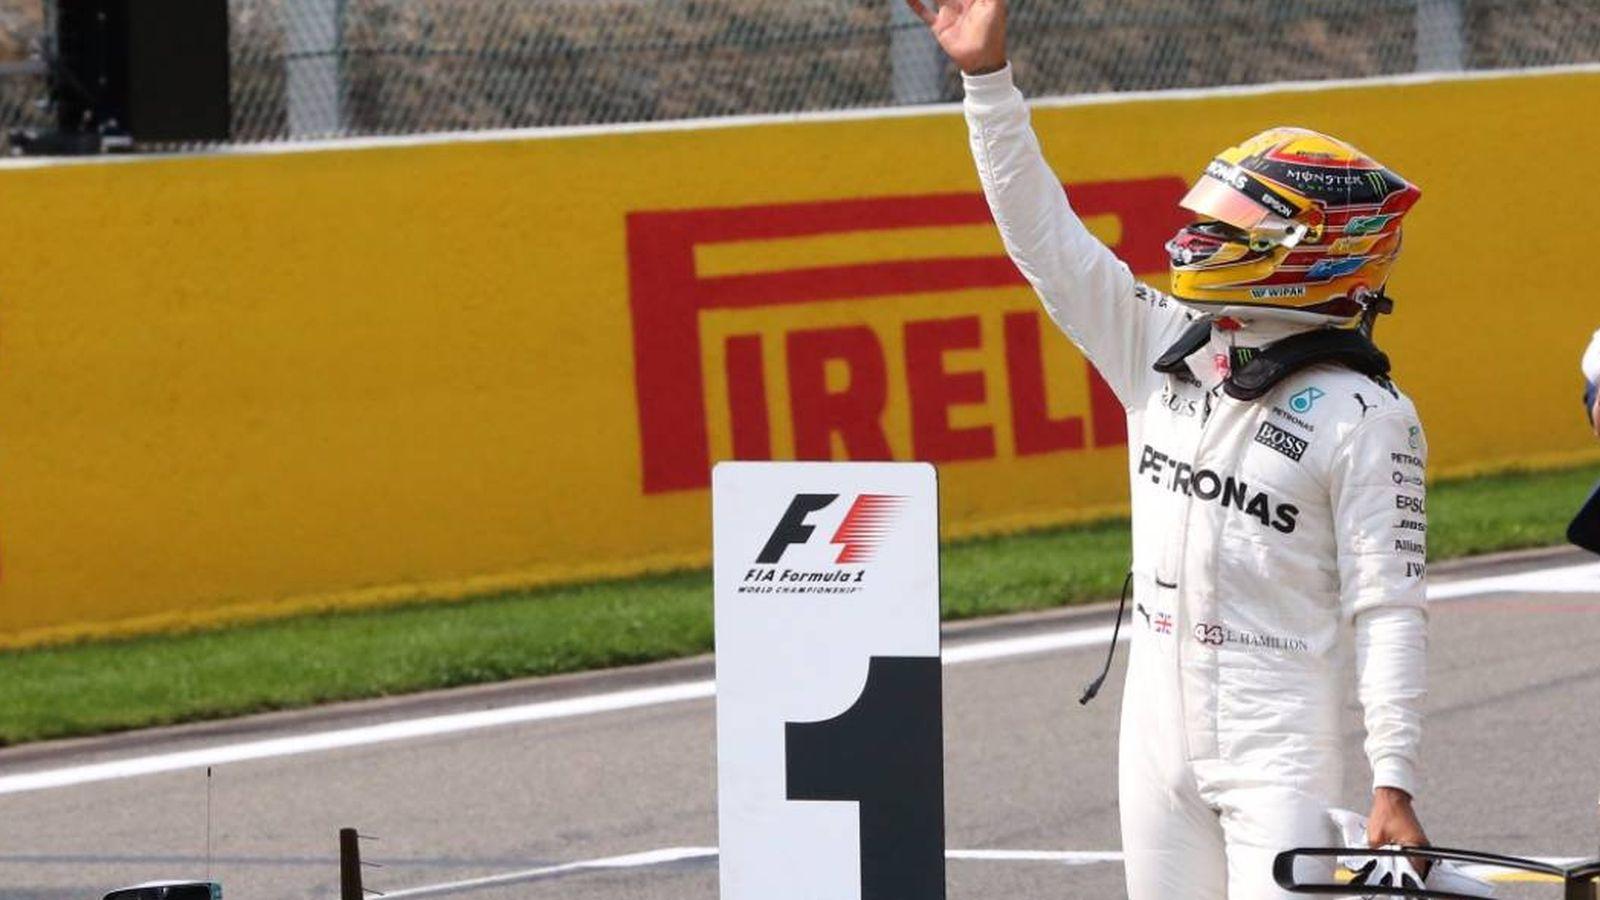 Foto: Hamilton, celebrando la pole en Bélgica. (Foto: @MercedesAMGF1)